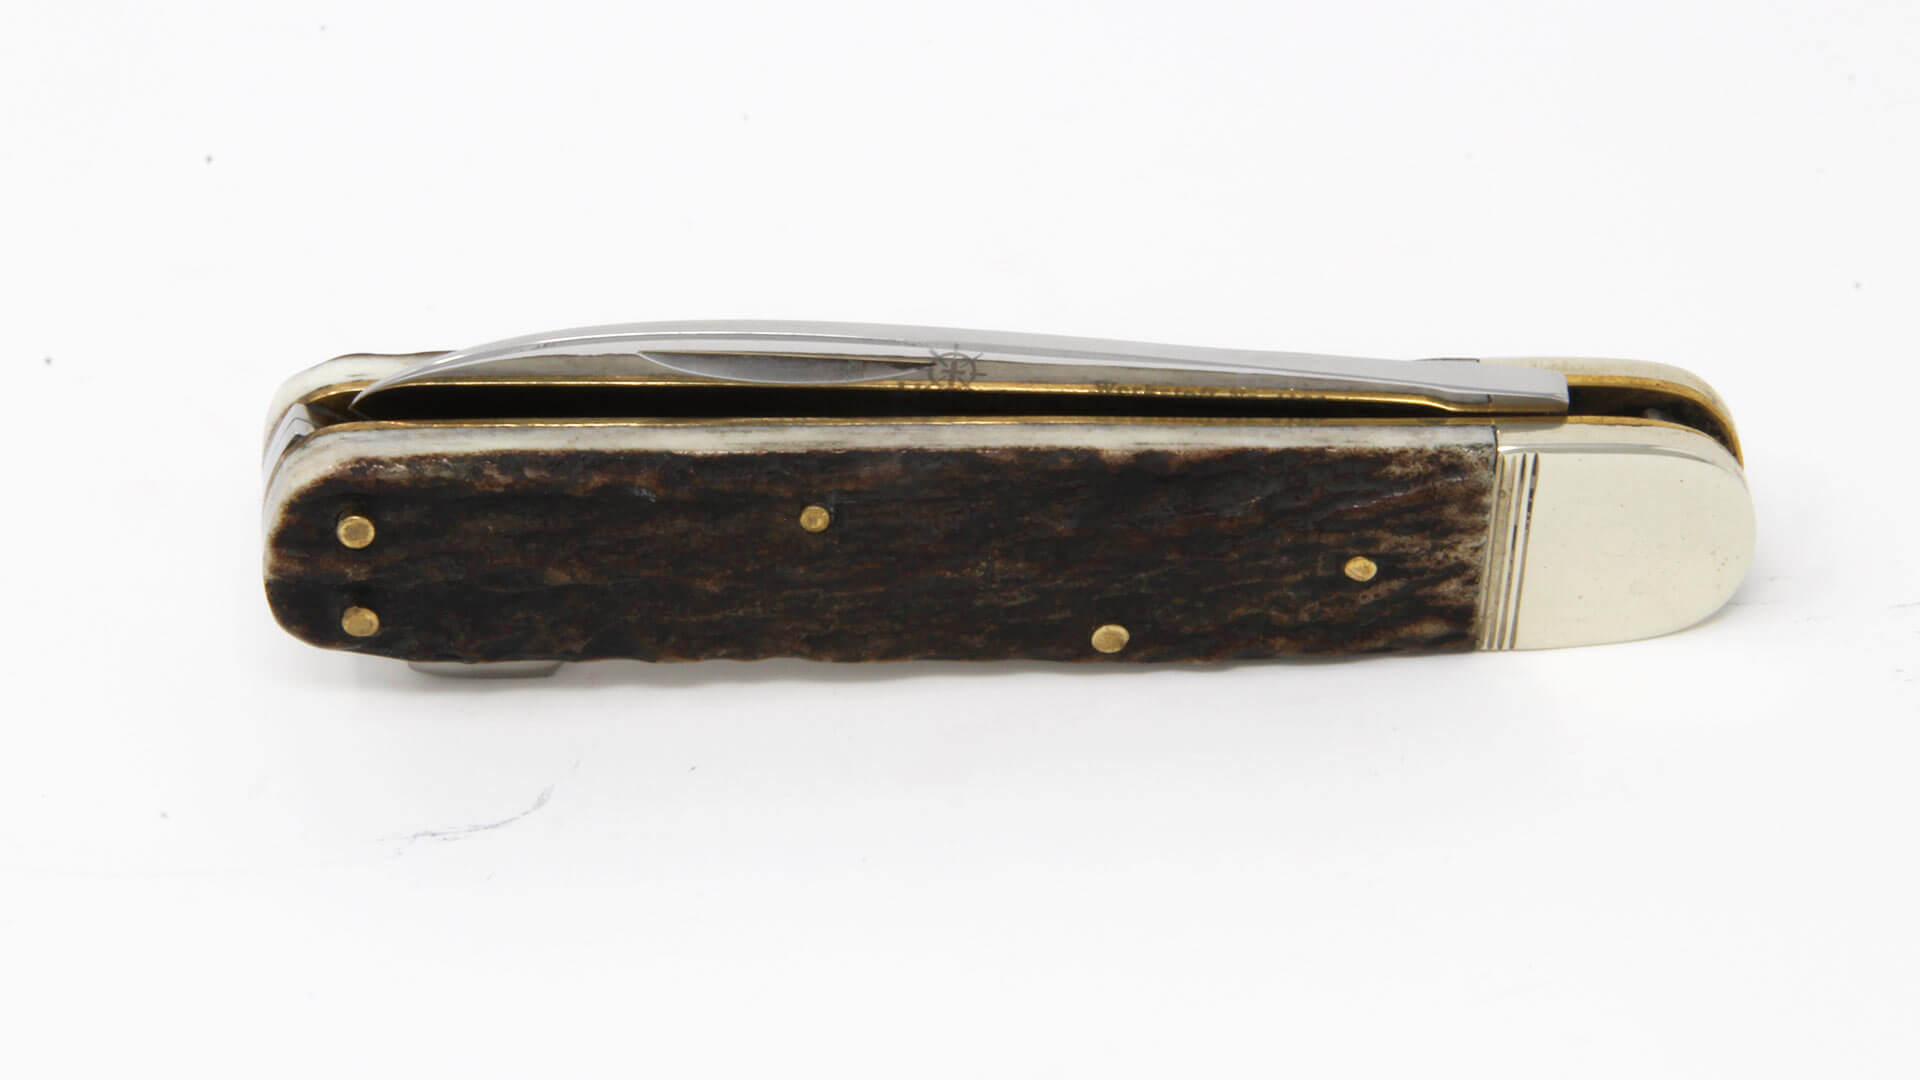 Hubertus Serie 12 Jagdtaschenmesser